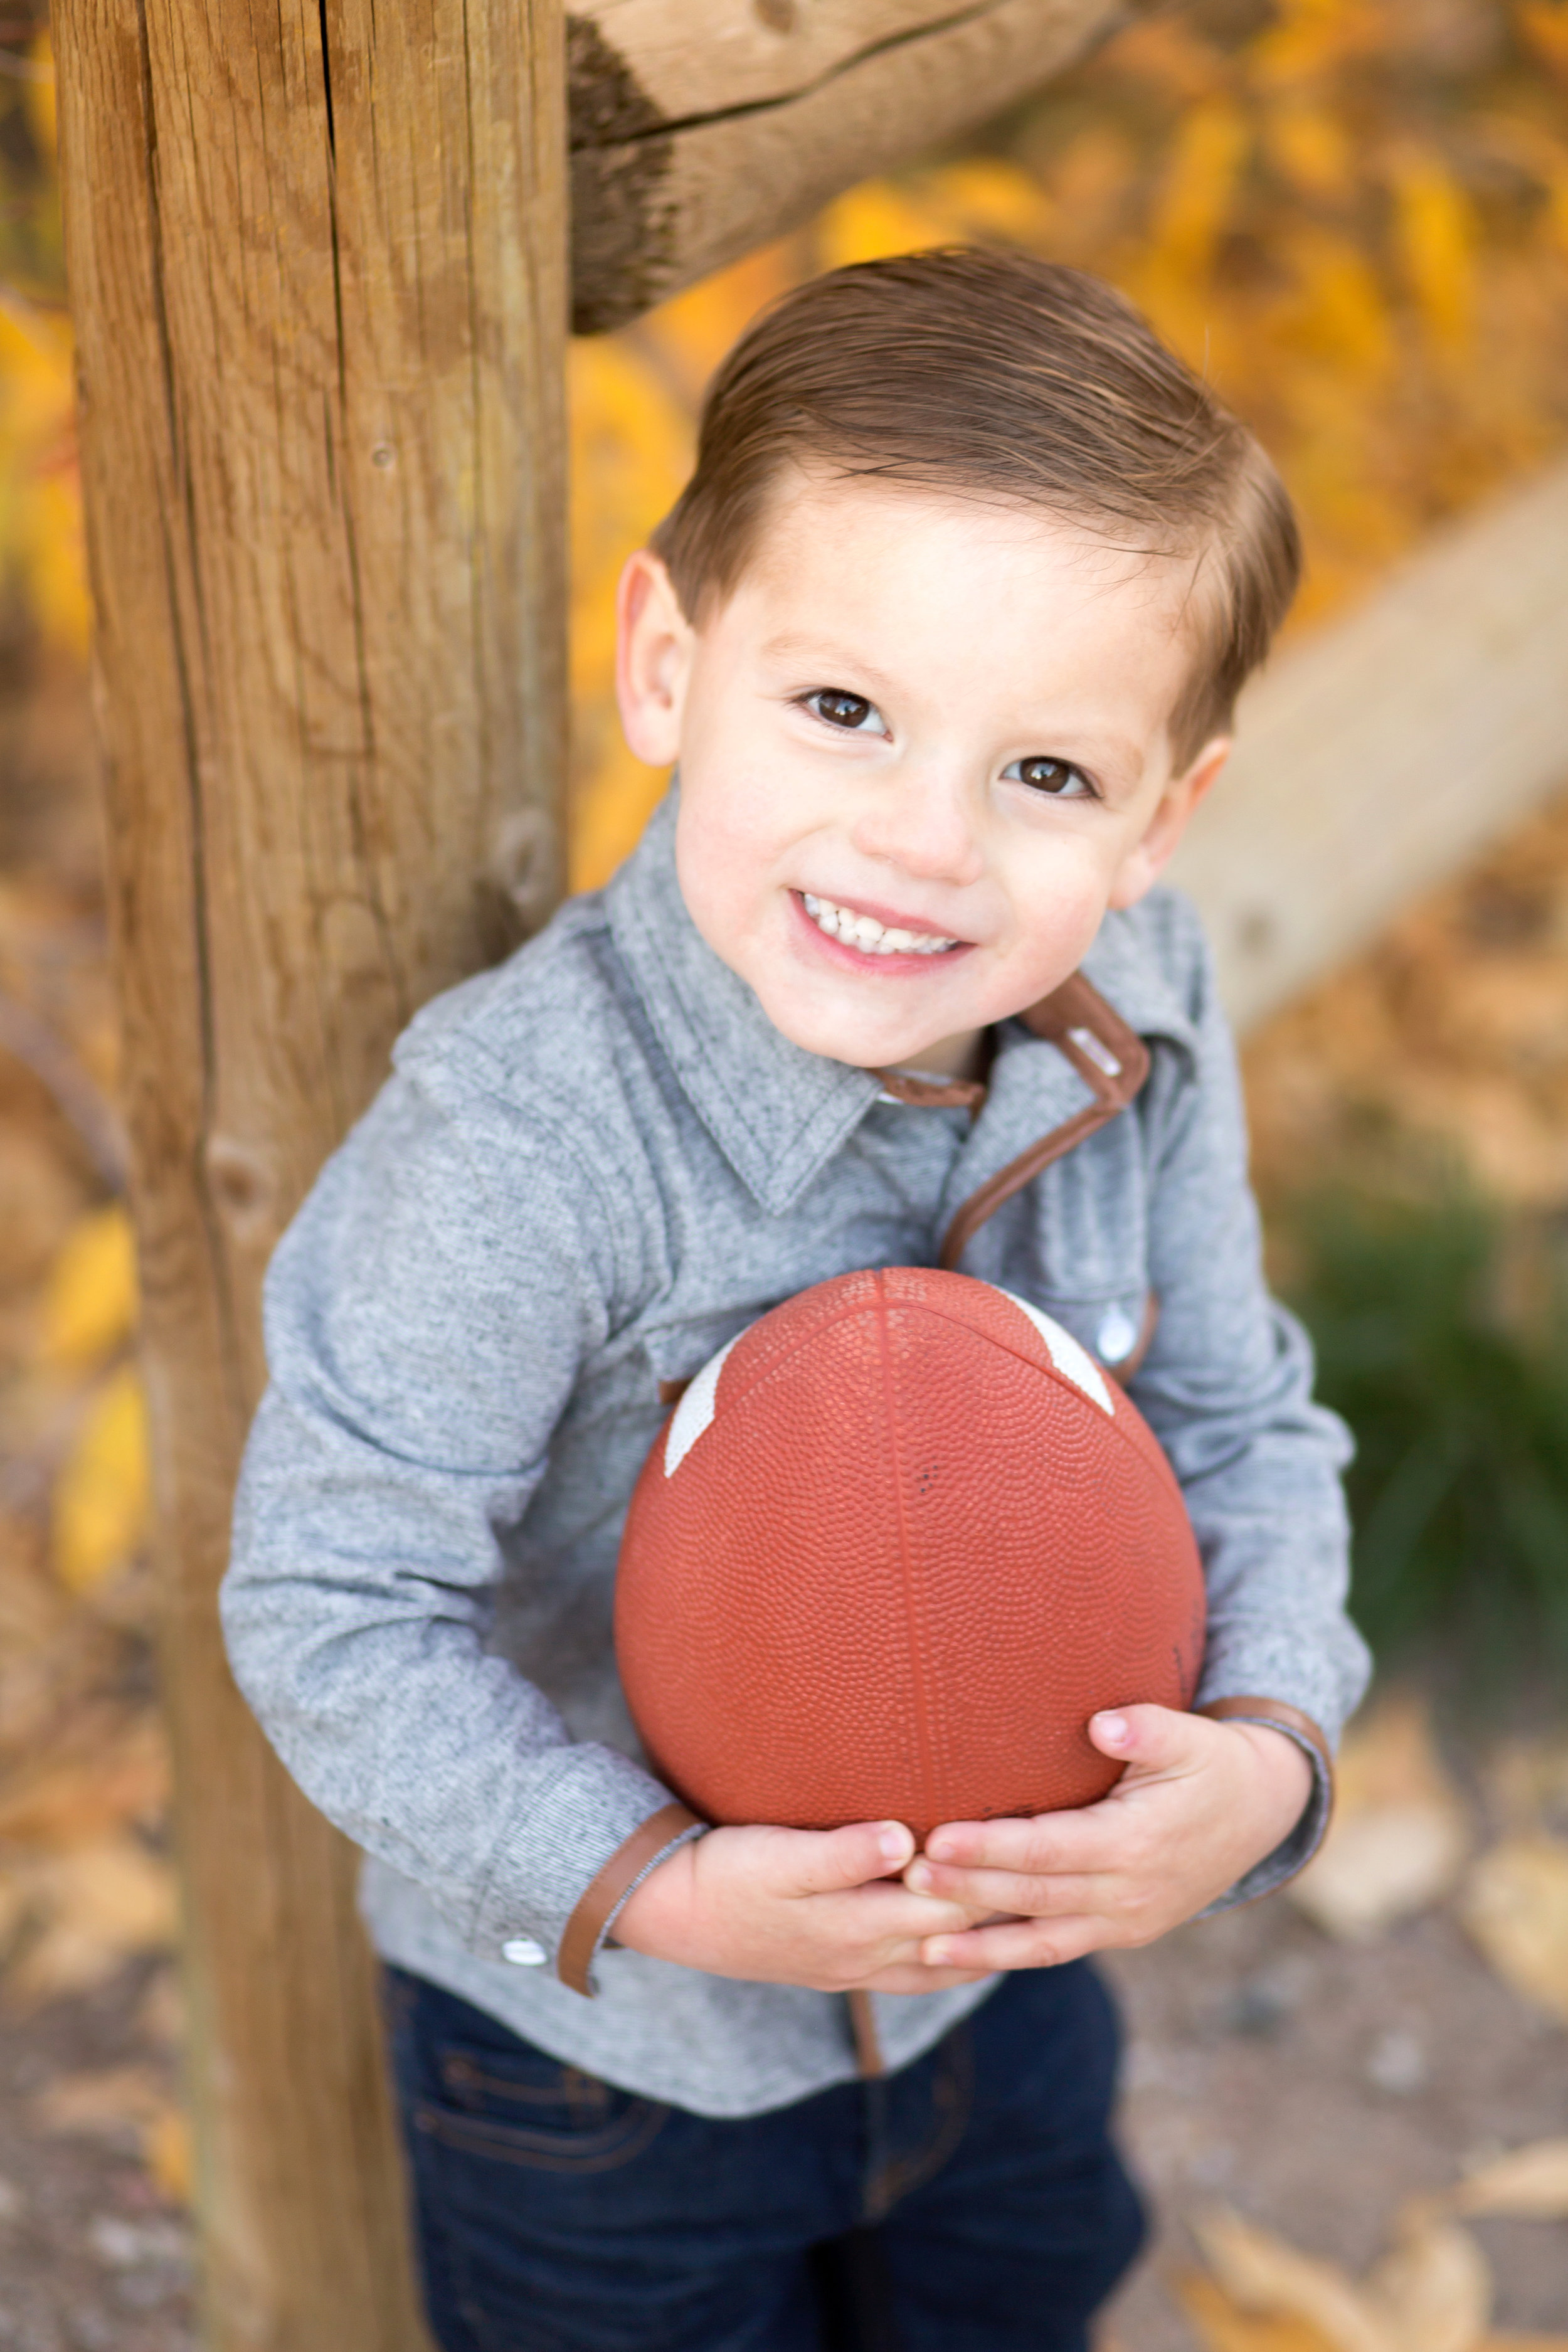 Denver Newborn Photographer, Denver Maternity Photographer, Boulder Newborn Photographer, Boulder Maternity Photographer